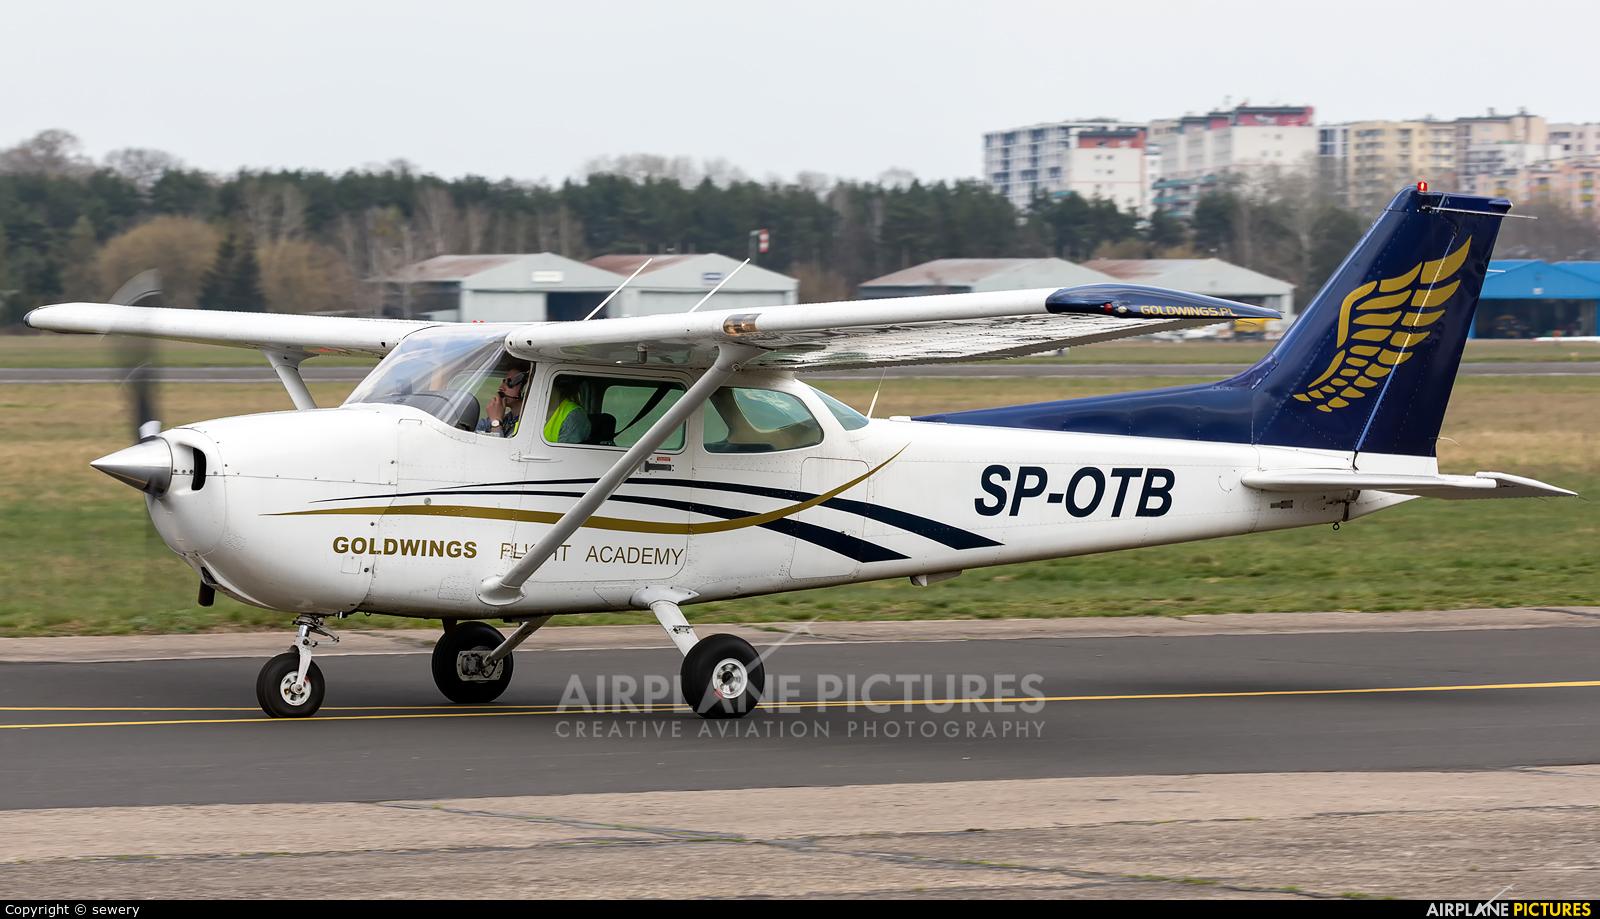 Goldwings Flight Academy SP-OTB aircraft at Warsaw - Babice